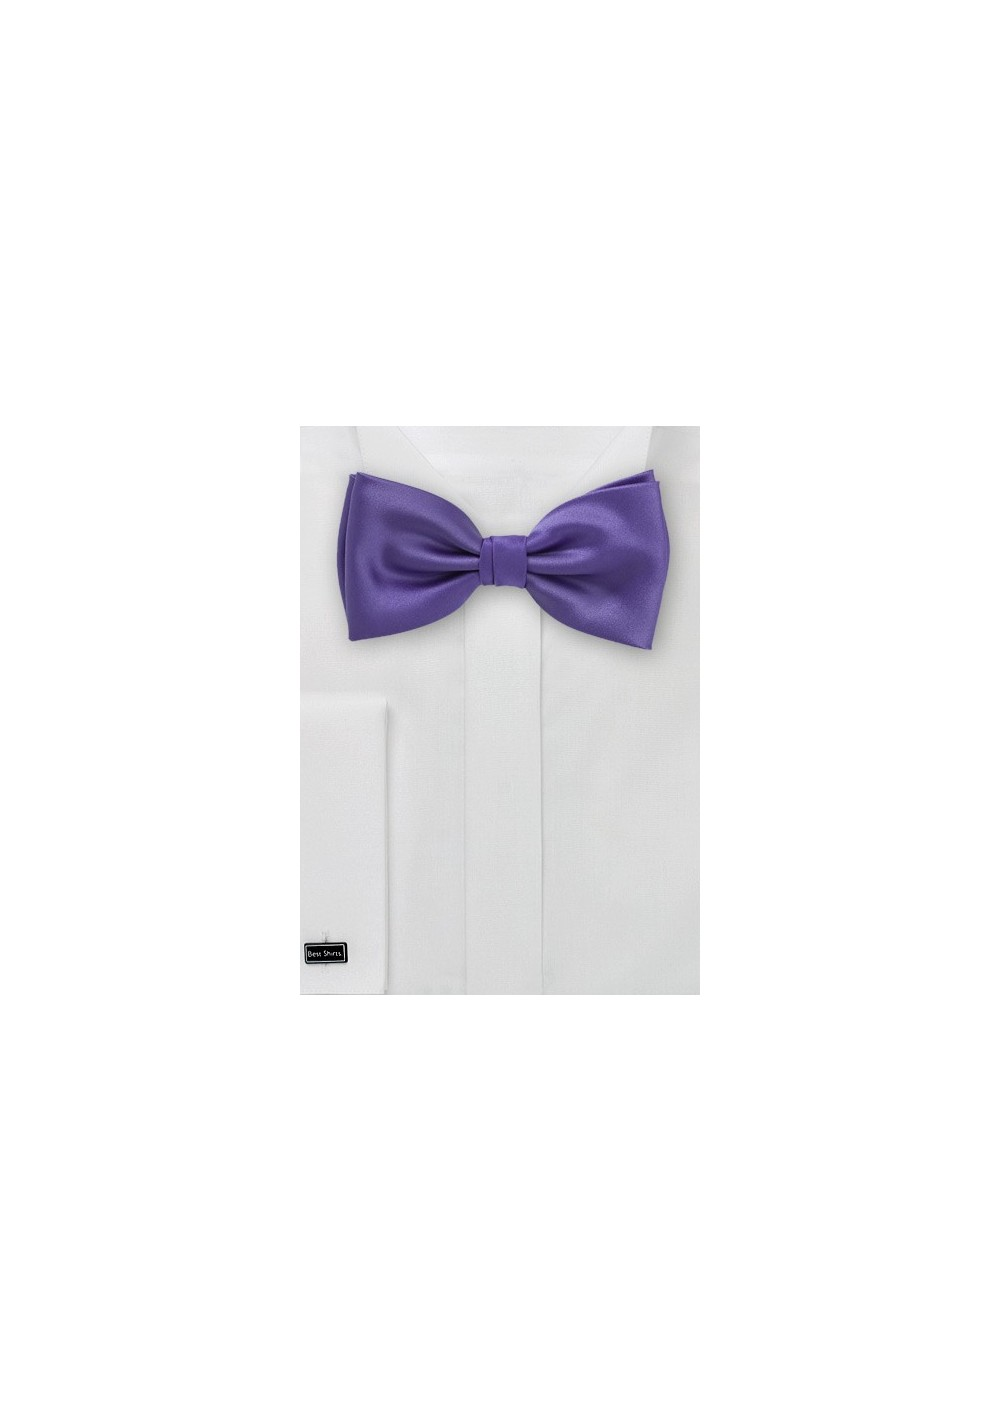 Solid Purple Bow Tie